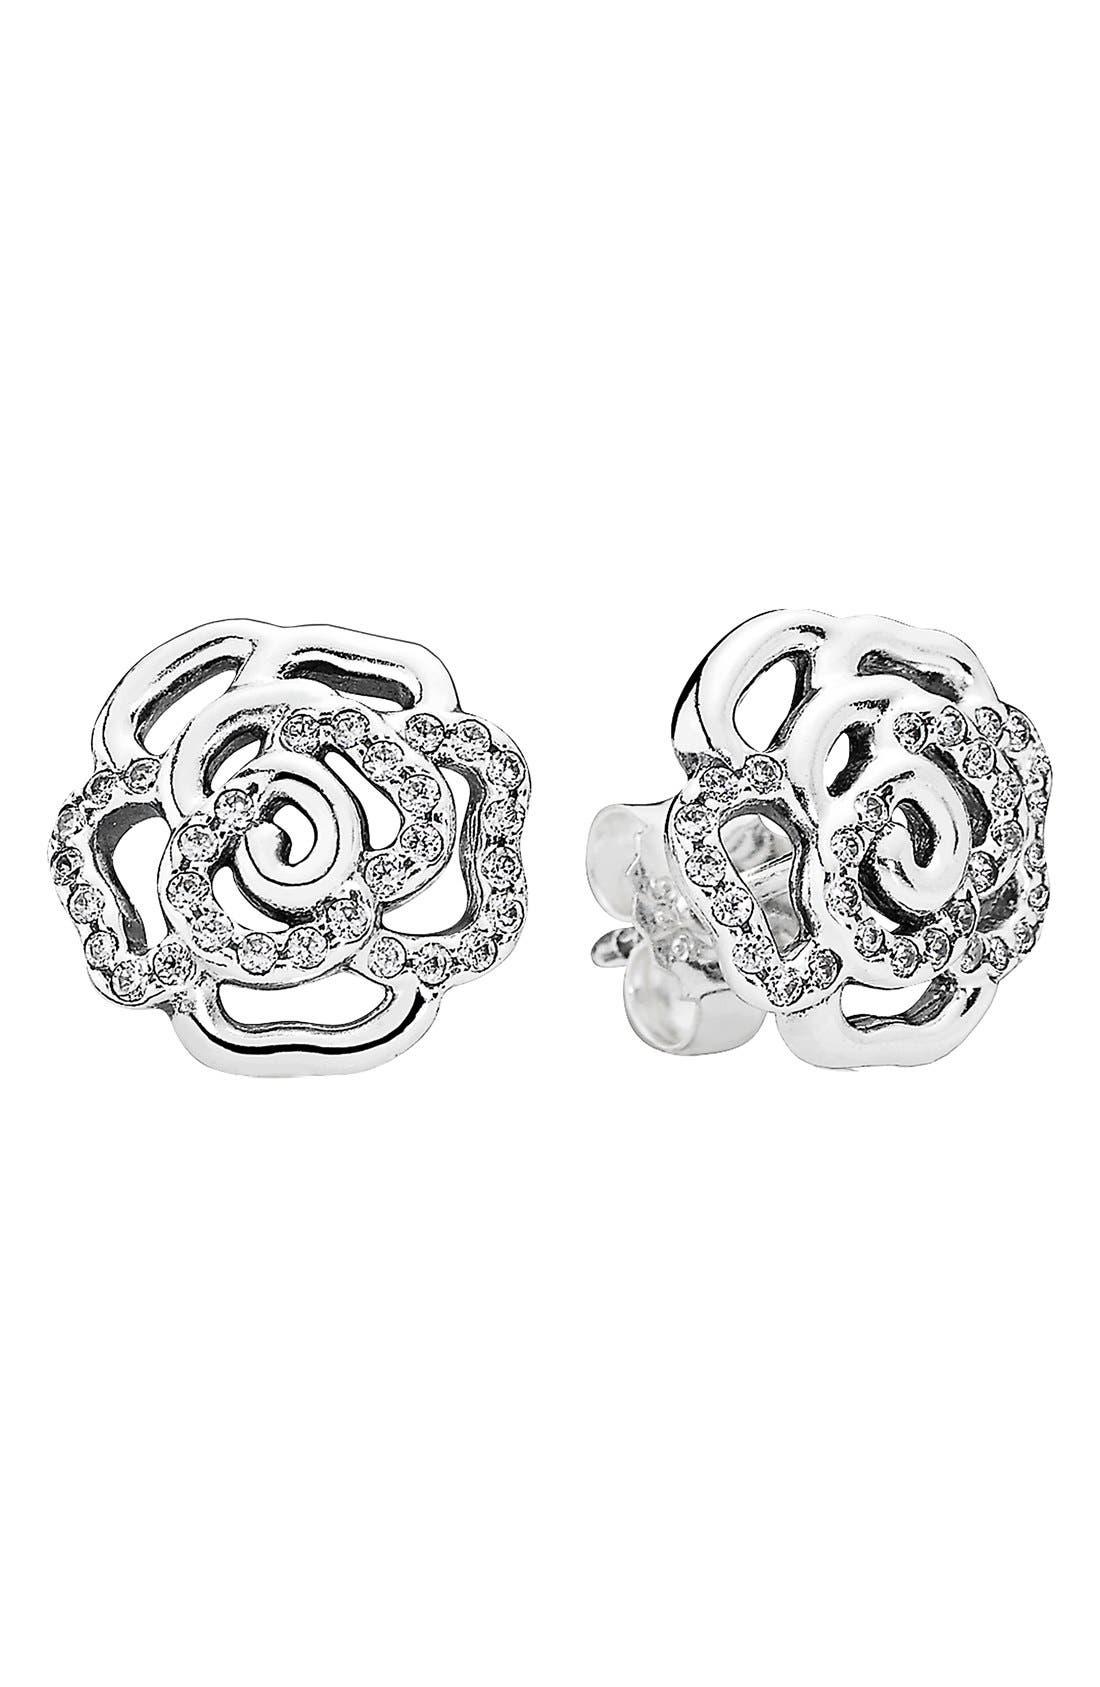 Main Image - PANDORA 'Shimmering Rose' Stud Earrings